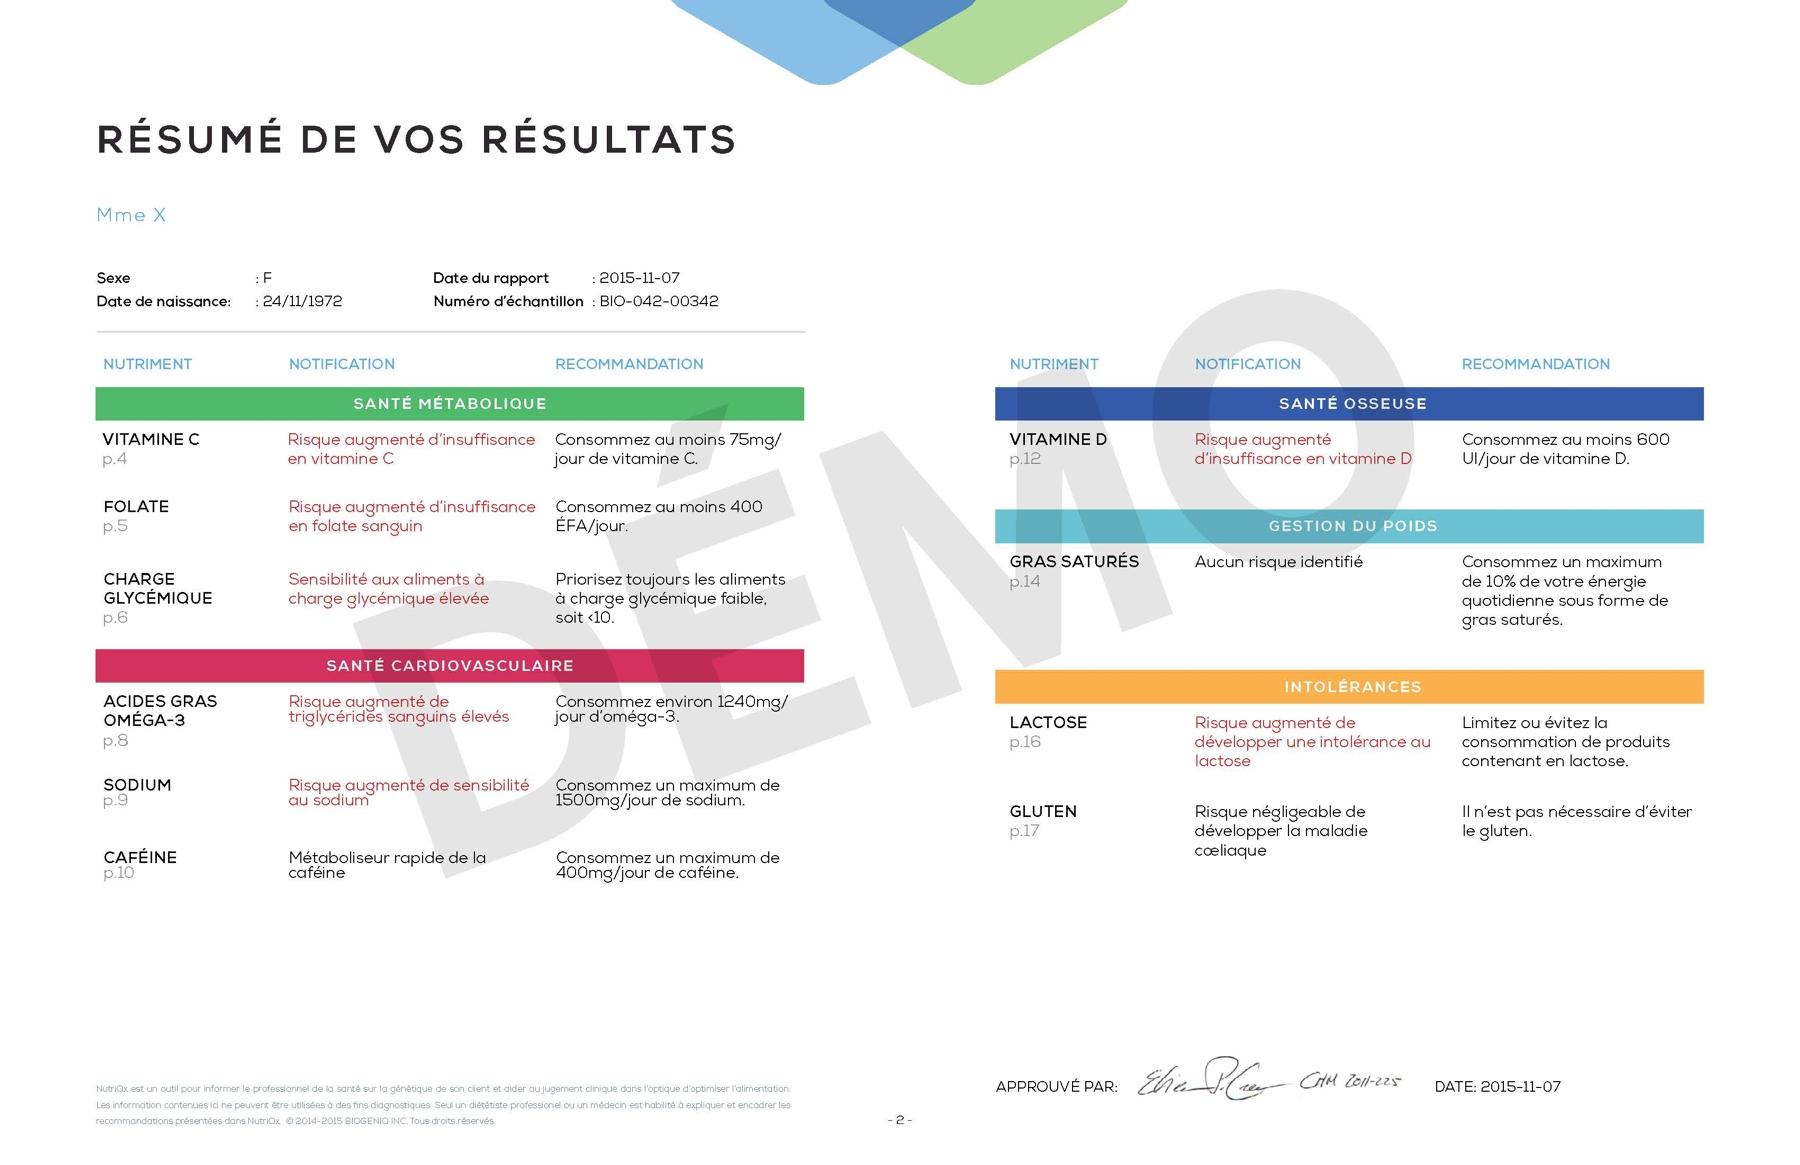 Rapport profil Nutrition Sommaire